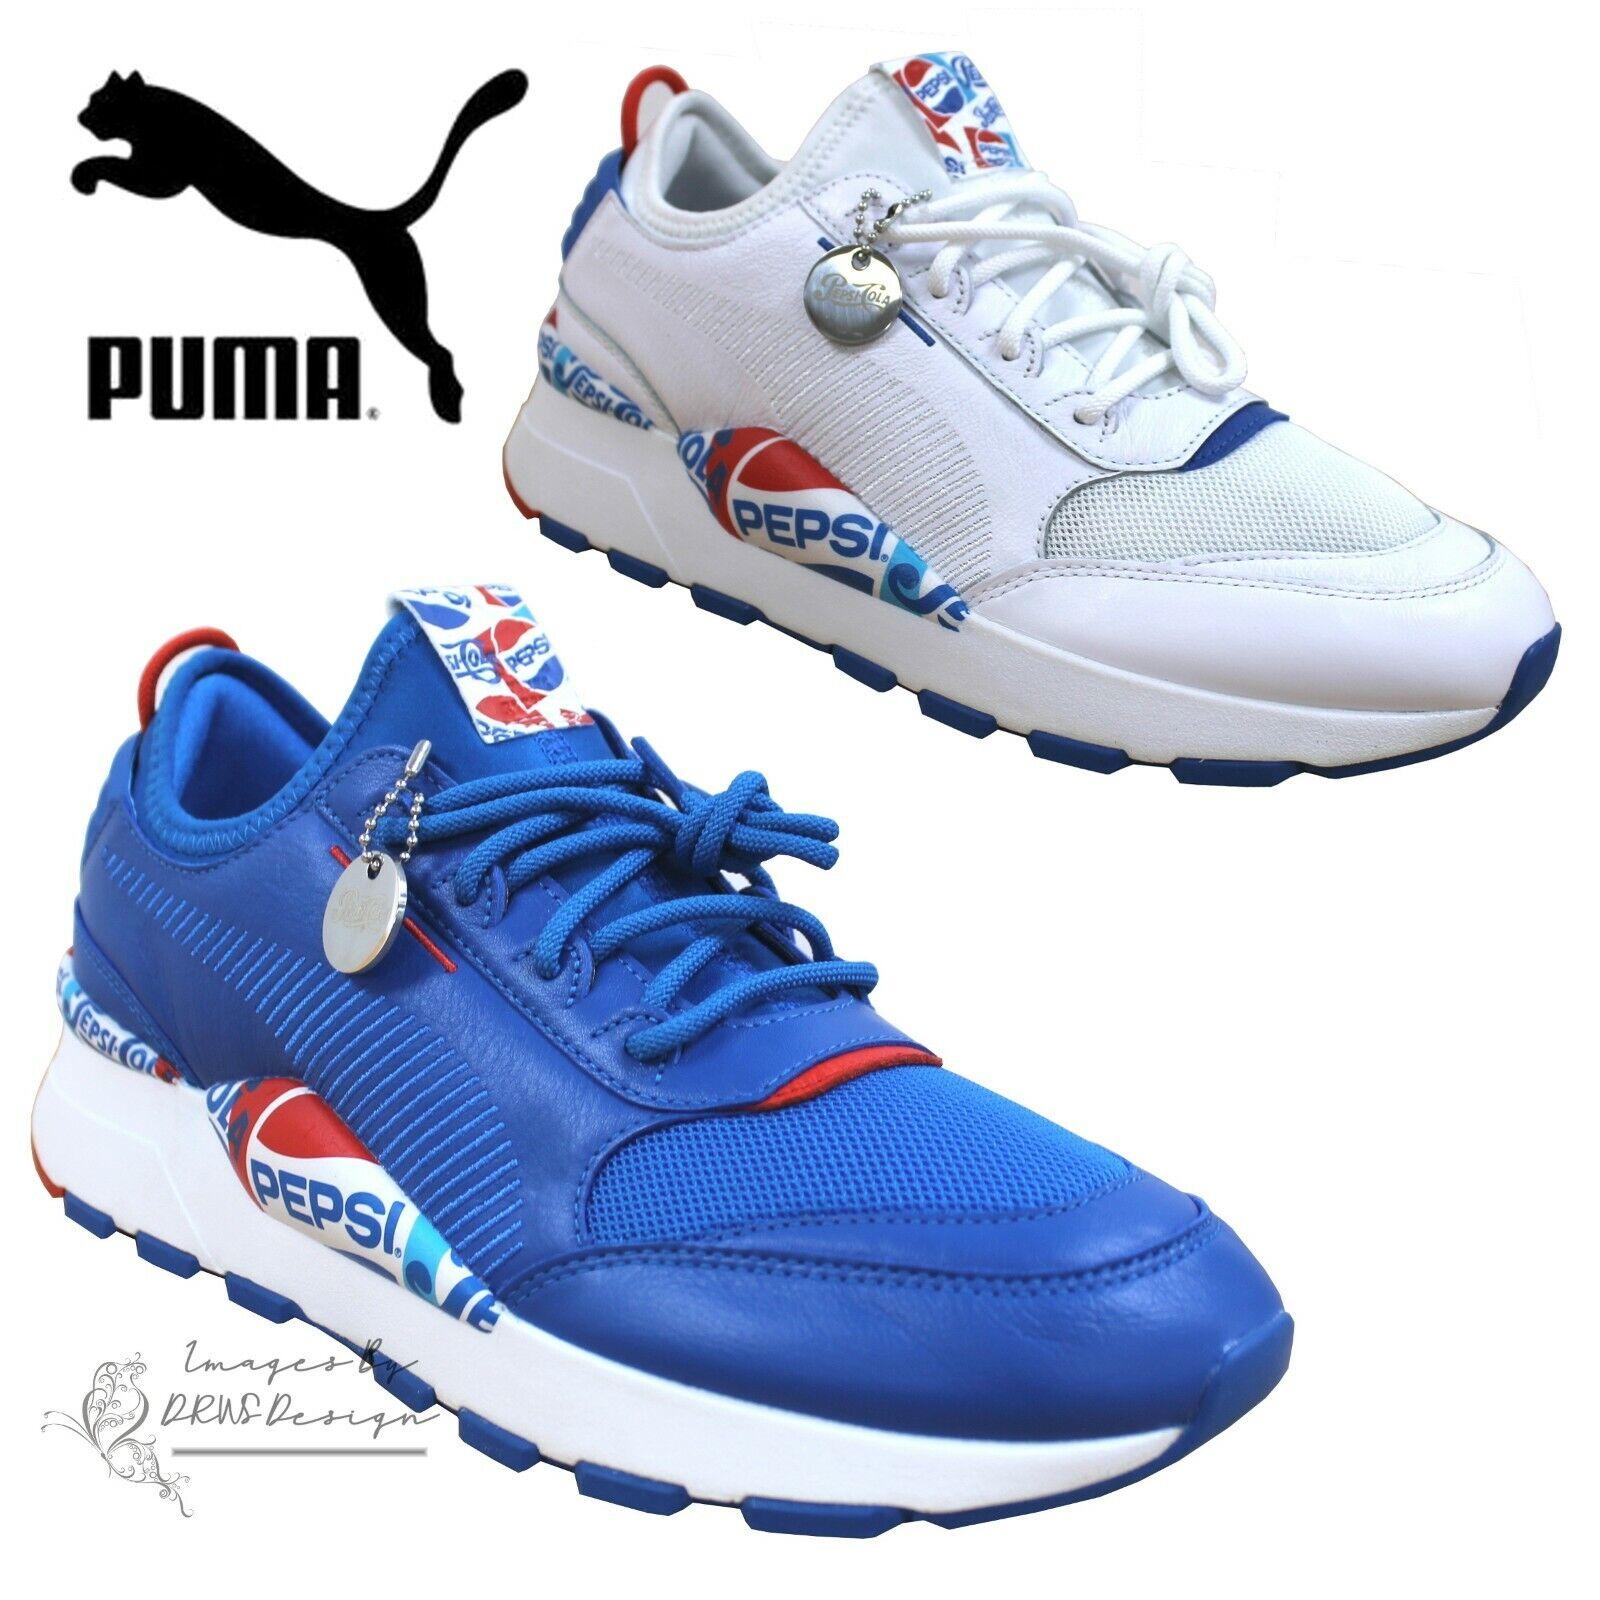 patinar Enmarañarse su  PUMA x PEPSI MAX RS-0 Men's Trainers Retro Running Sneakers | eBay